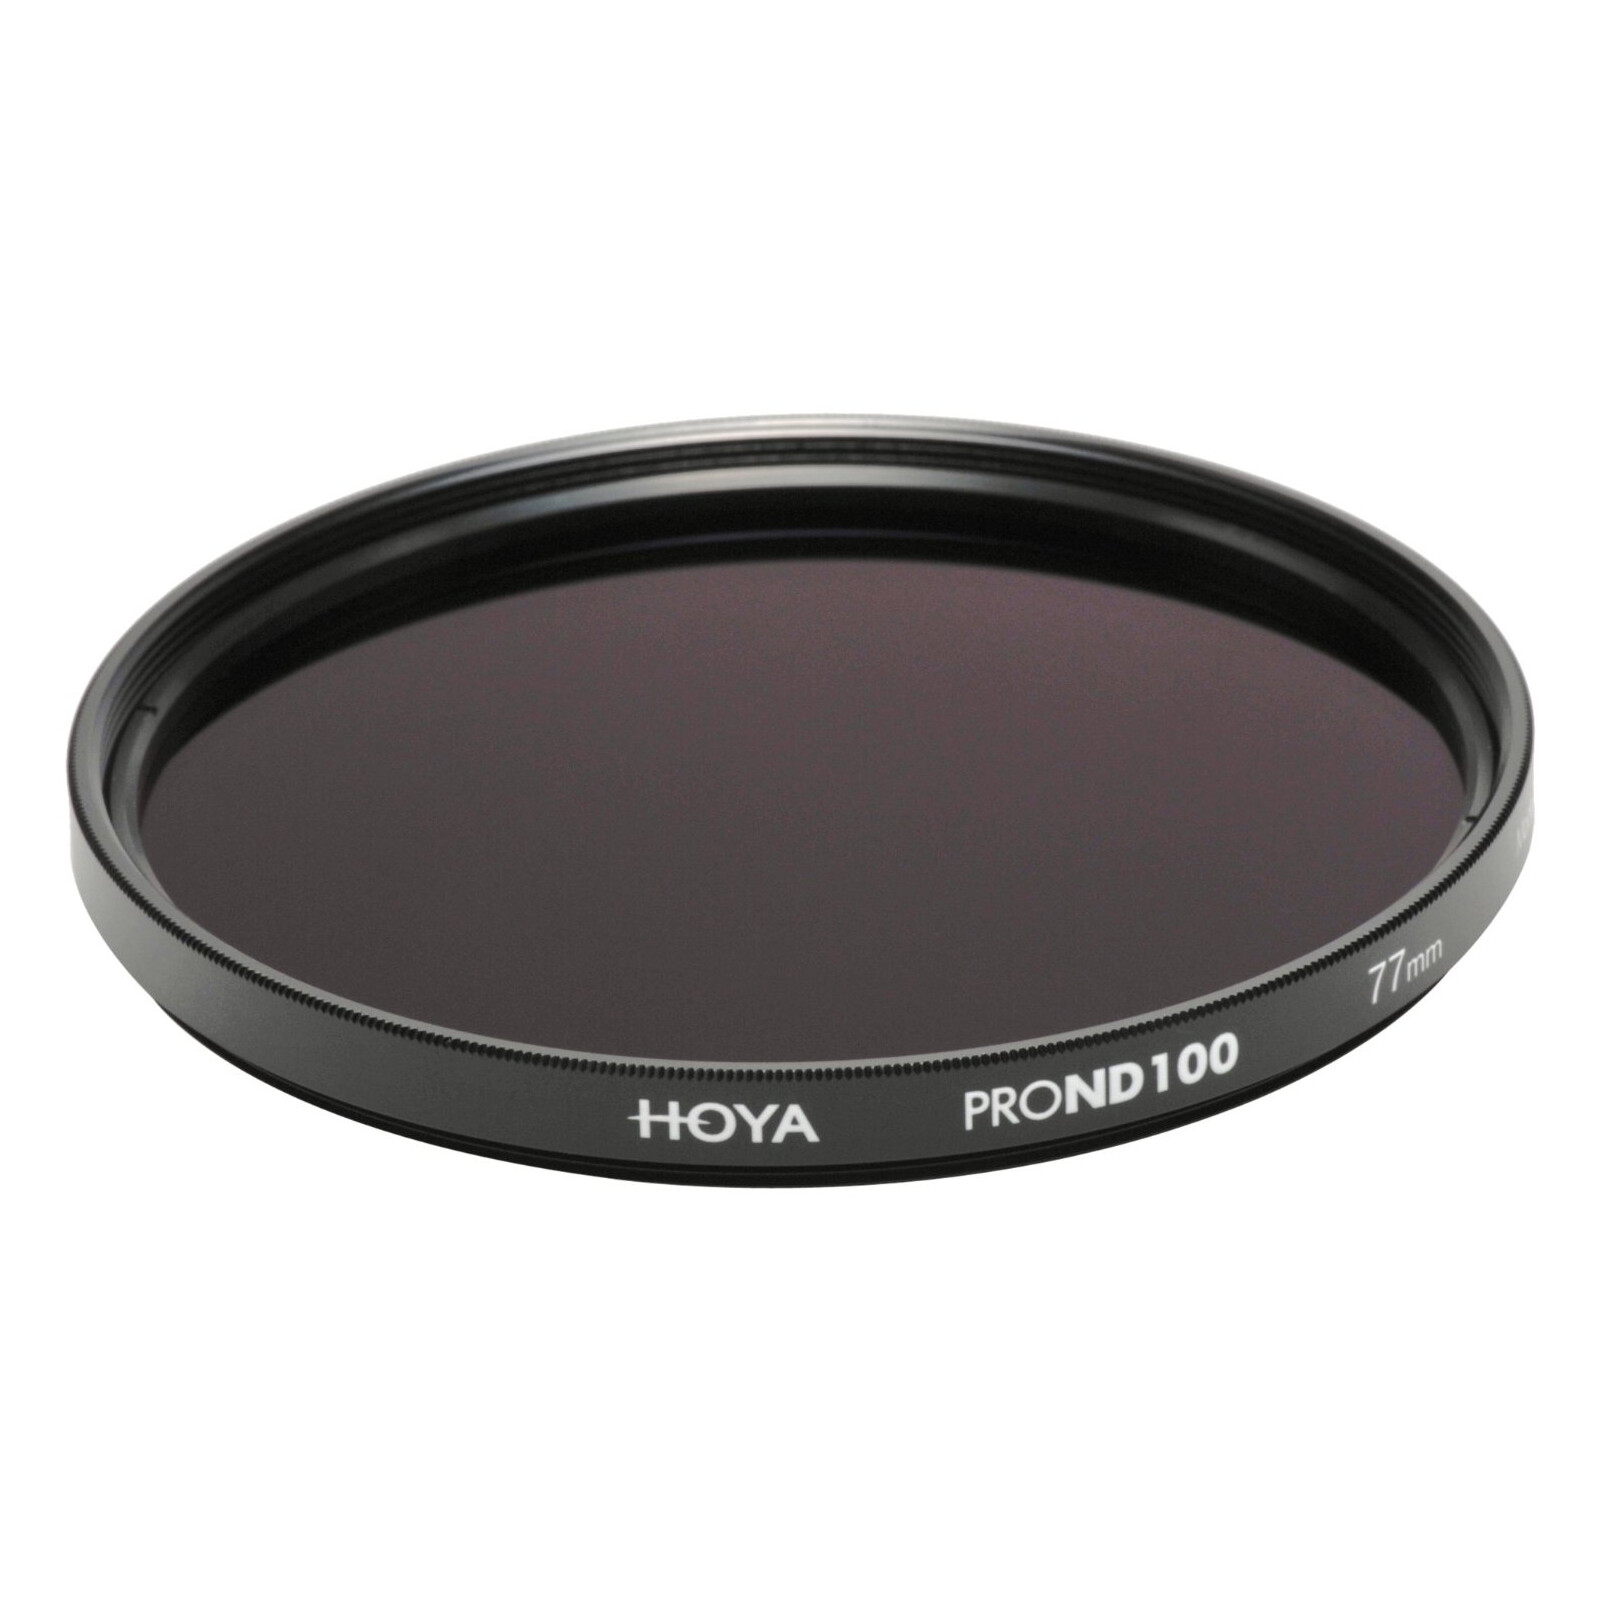 Hoya Grau PRO ND 100 67mm